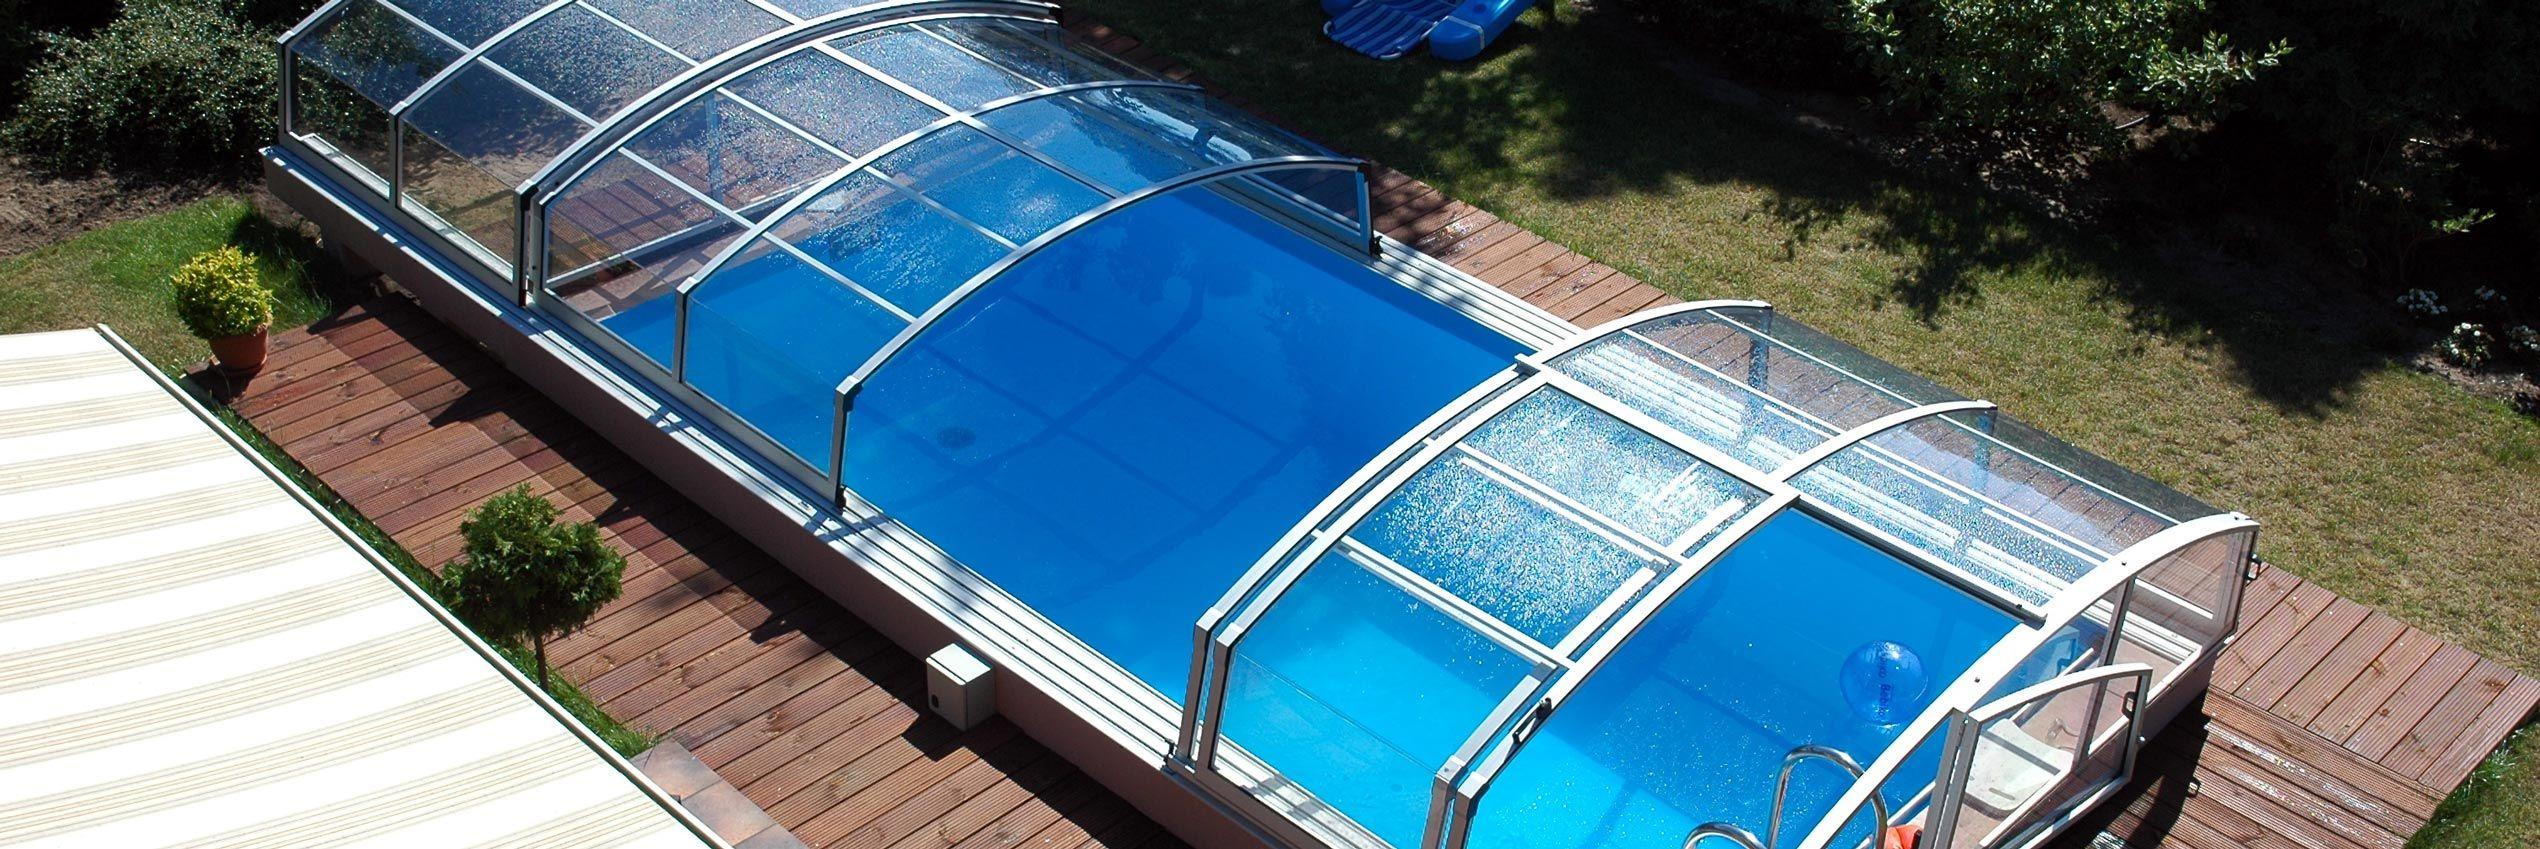 Abri de piscine imperia neo for Abri de piscine espagne